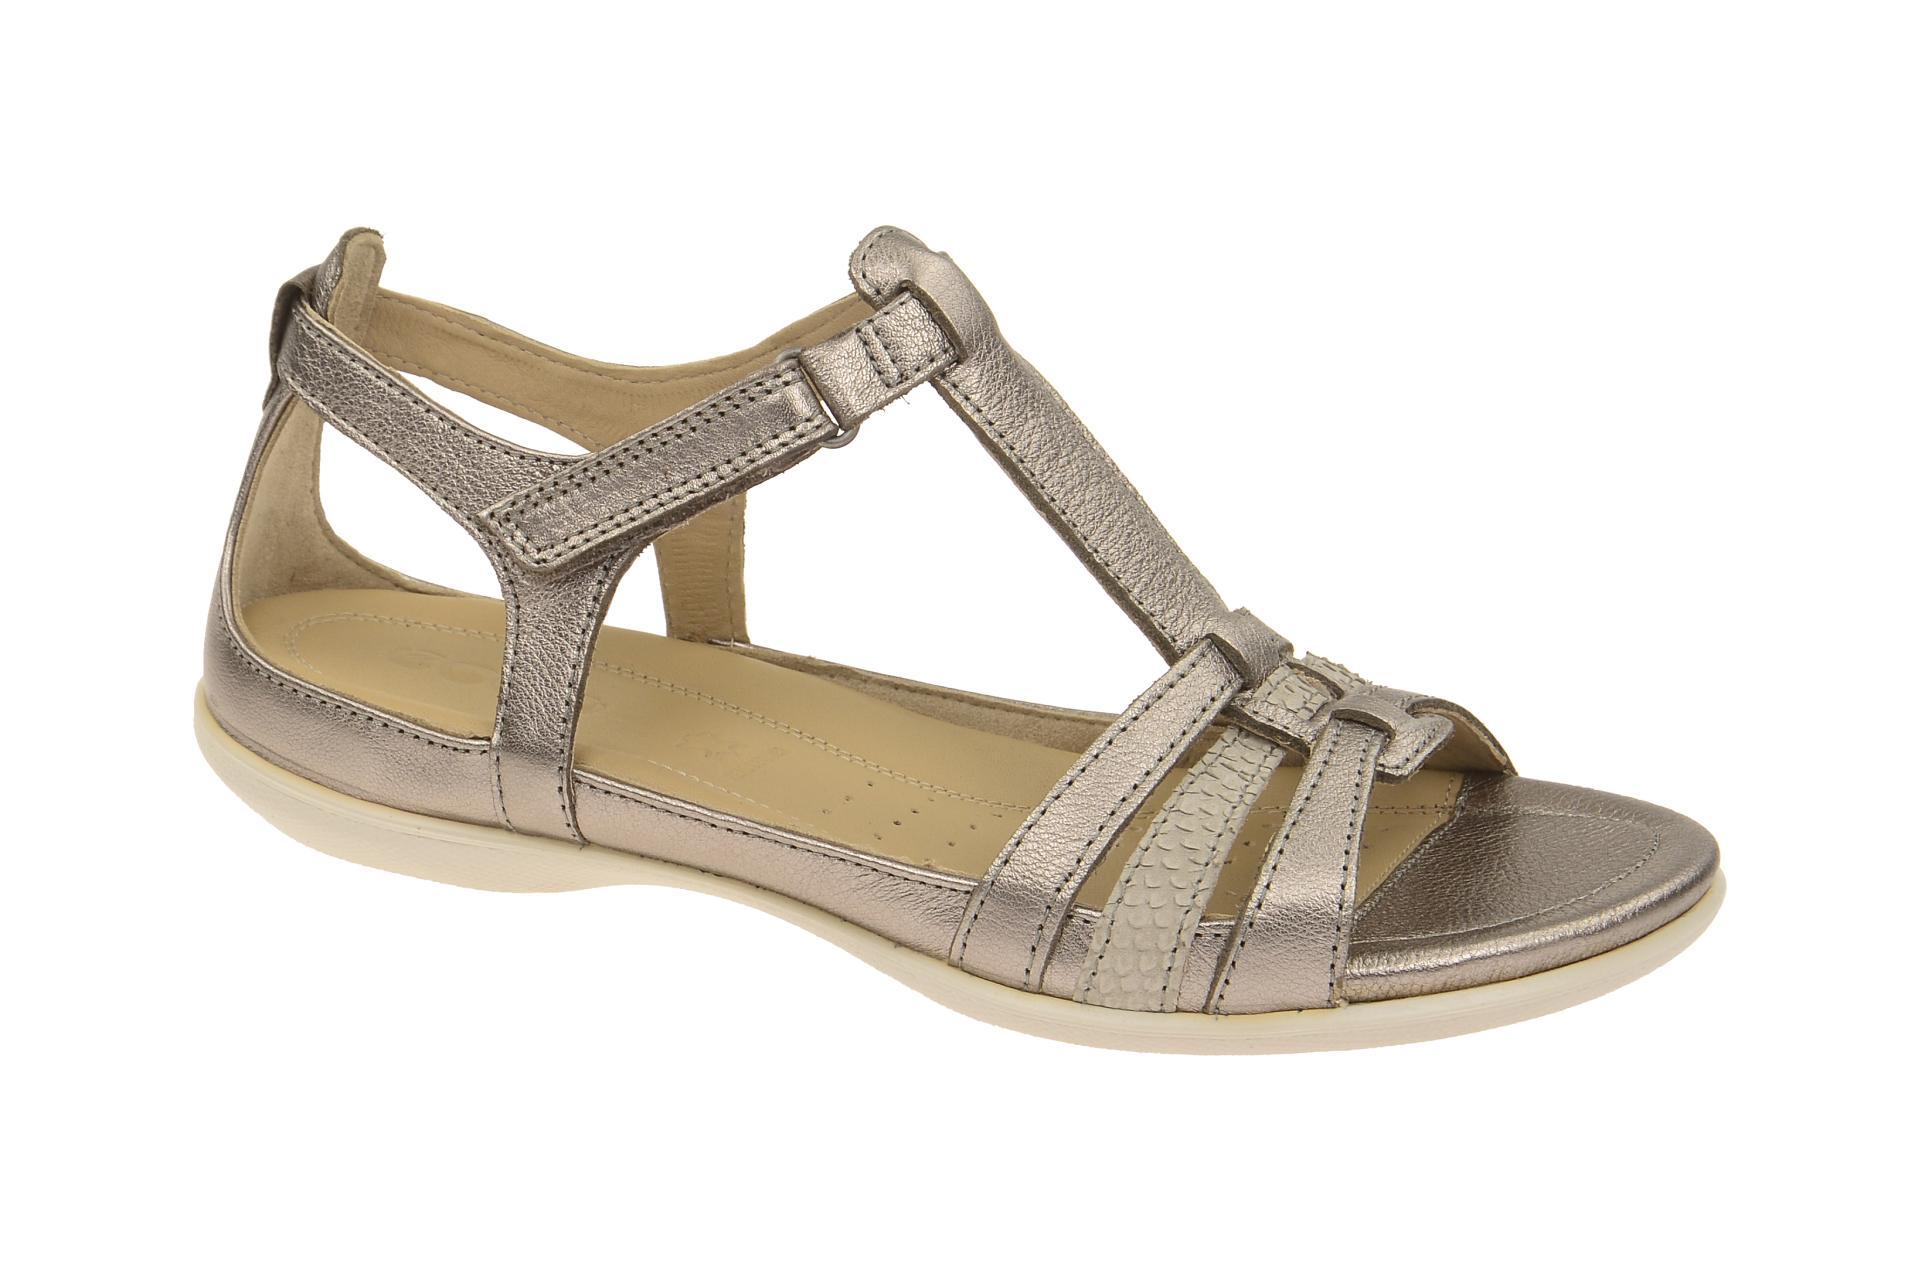 0ac0febe32b8ad Ecco Schuhe FLASH grau Damen Sandale Sandaletten 24087357462 NEU